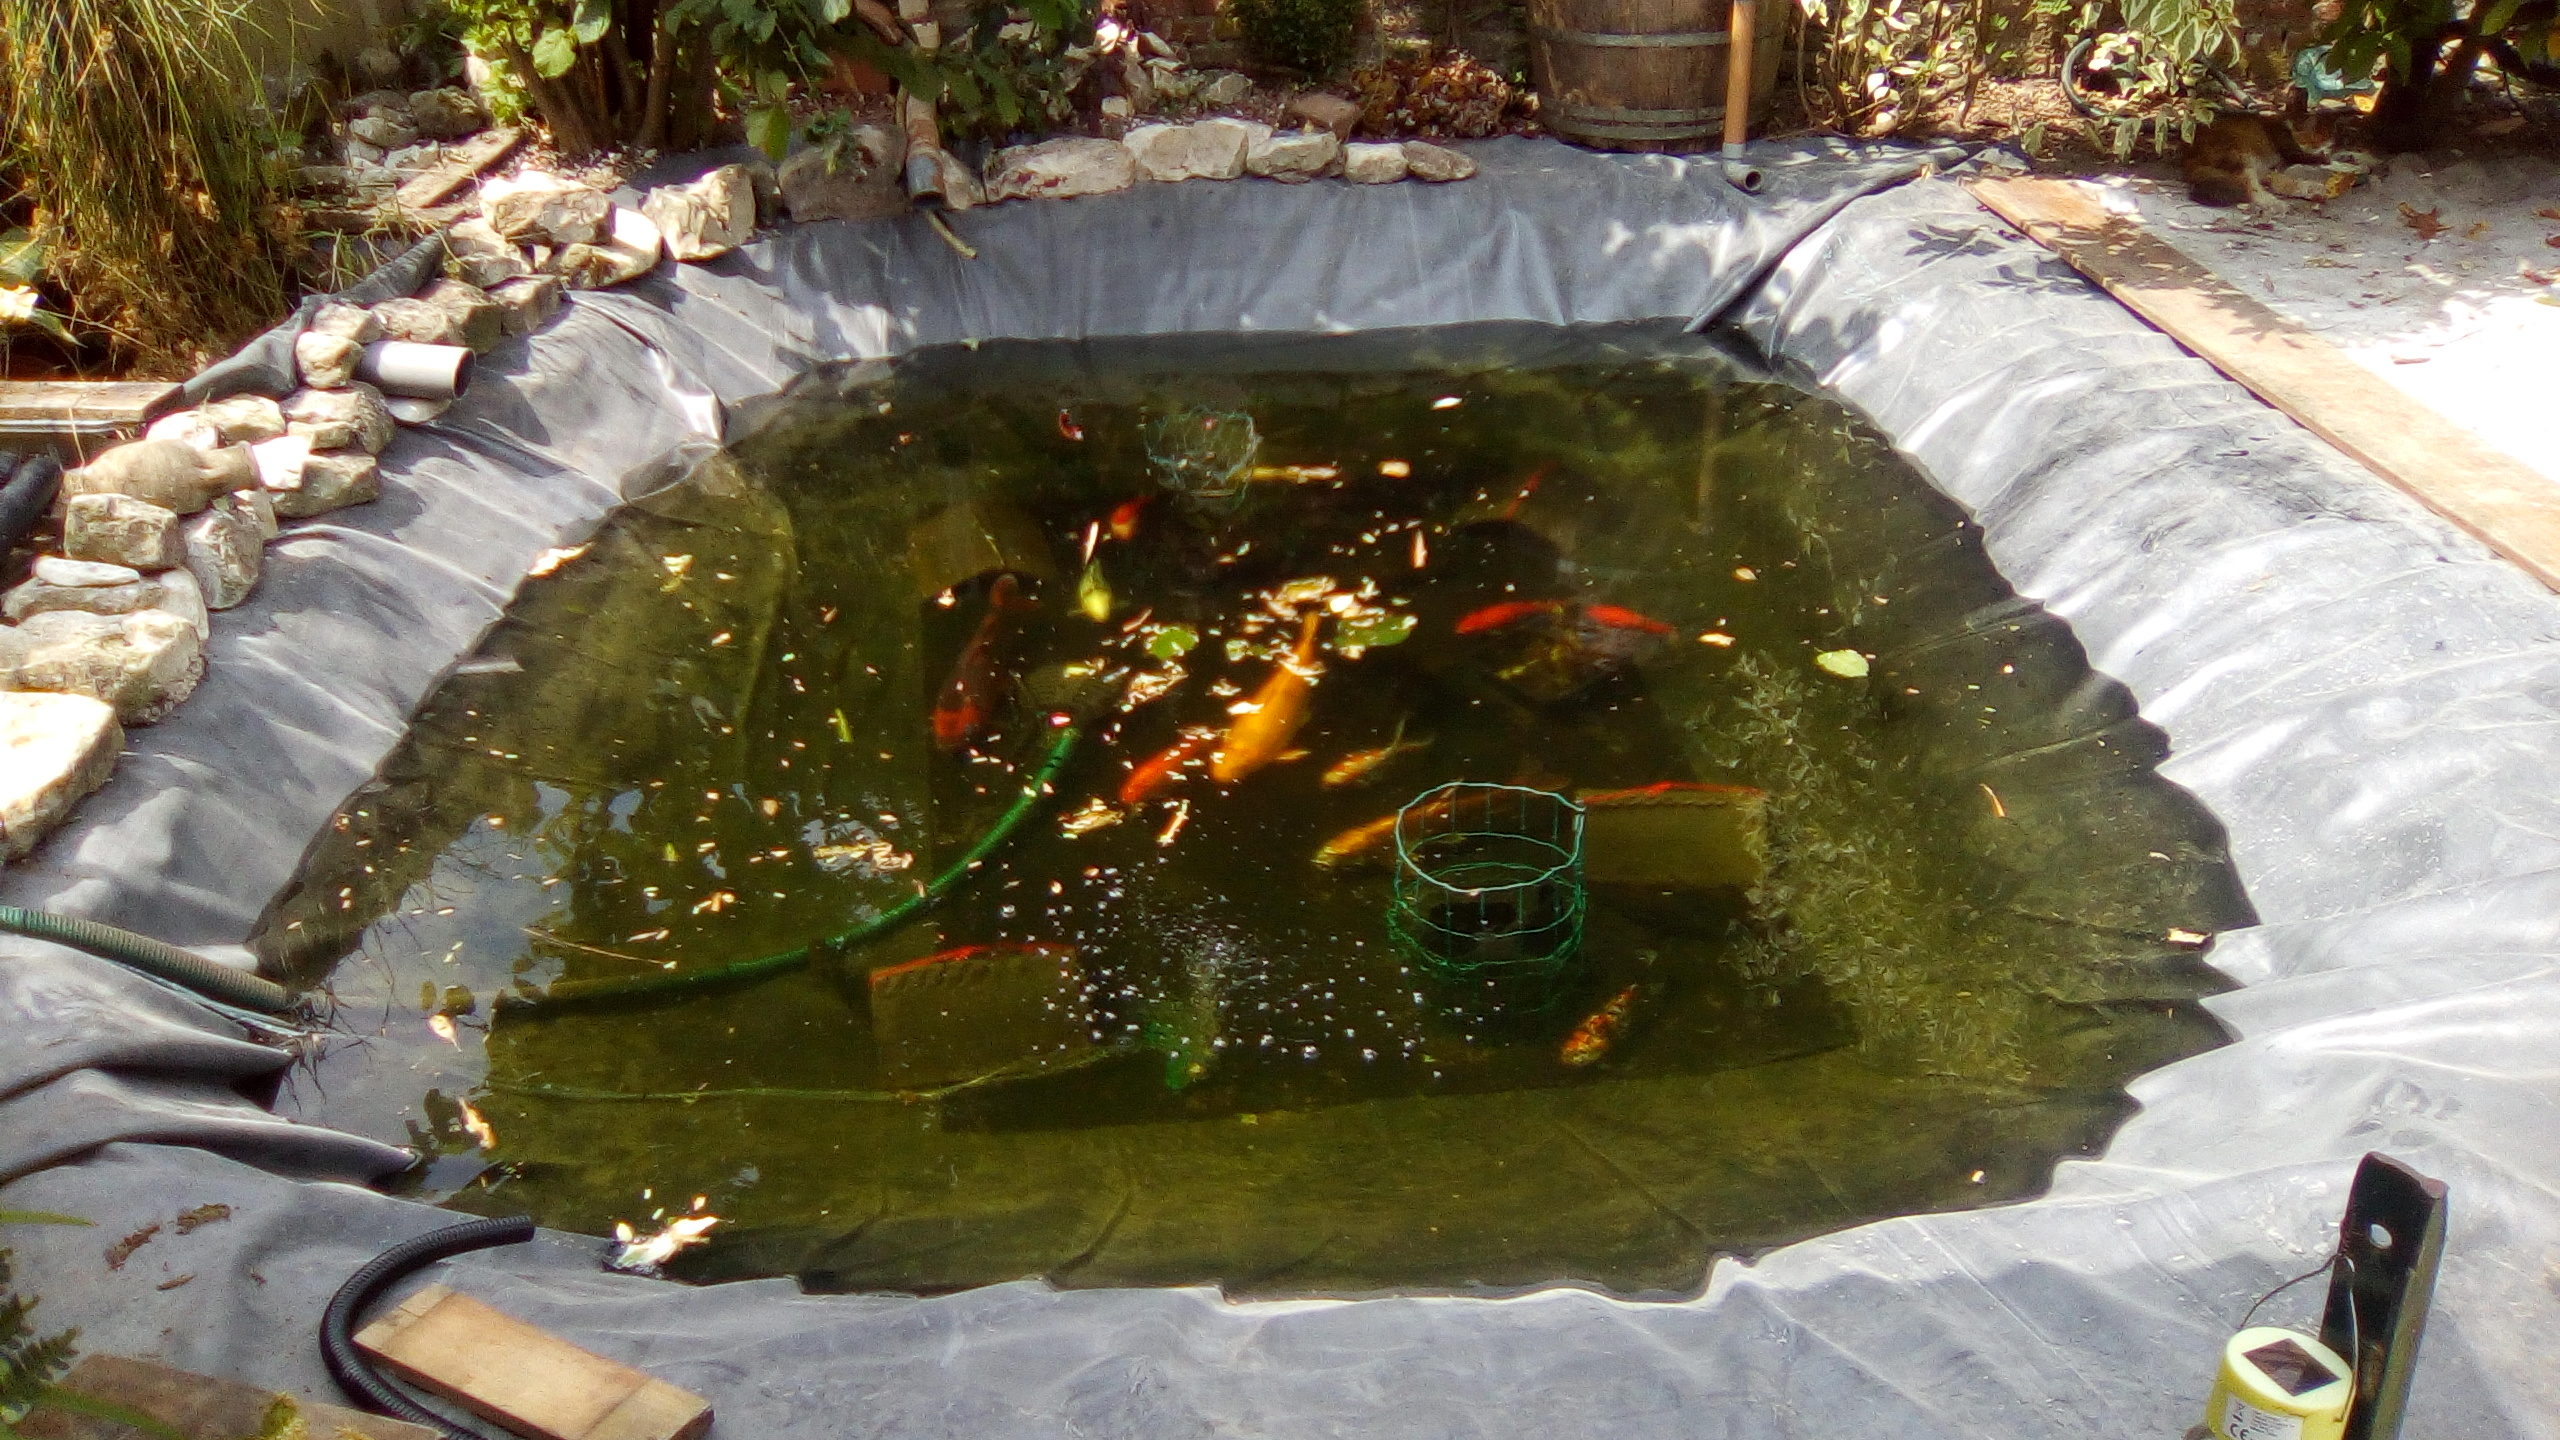 Poisson Rouge Bassin Extérieur restauration bassin - forum aquajardin - bassin koï, mare, étang